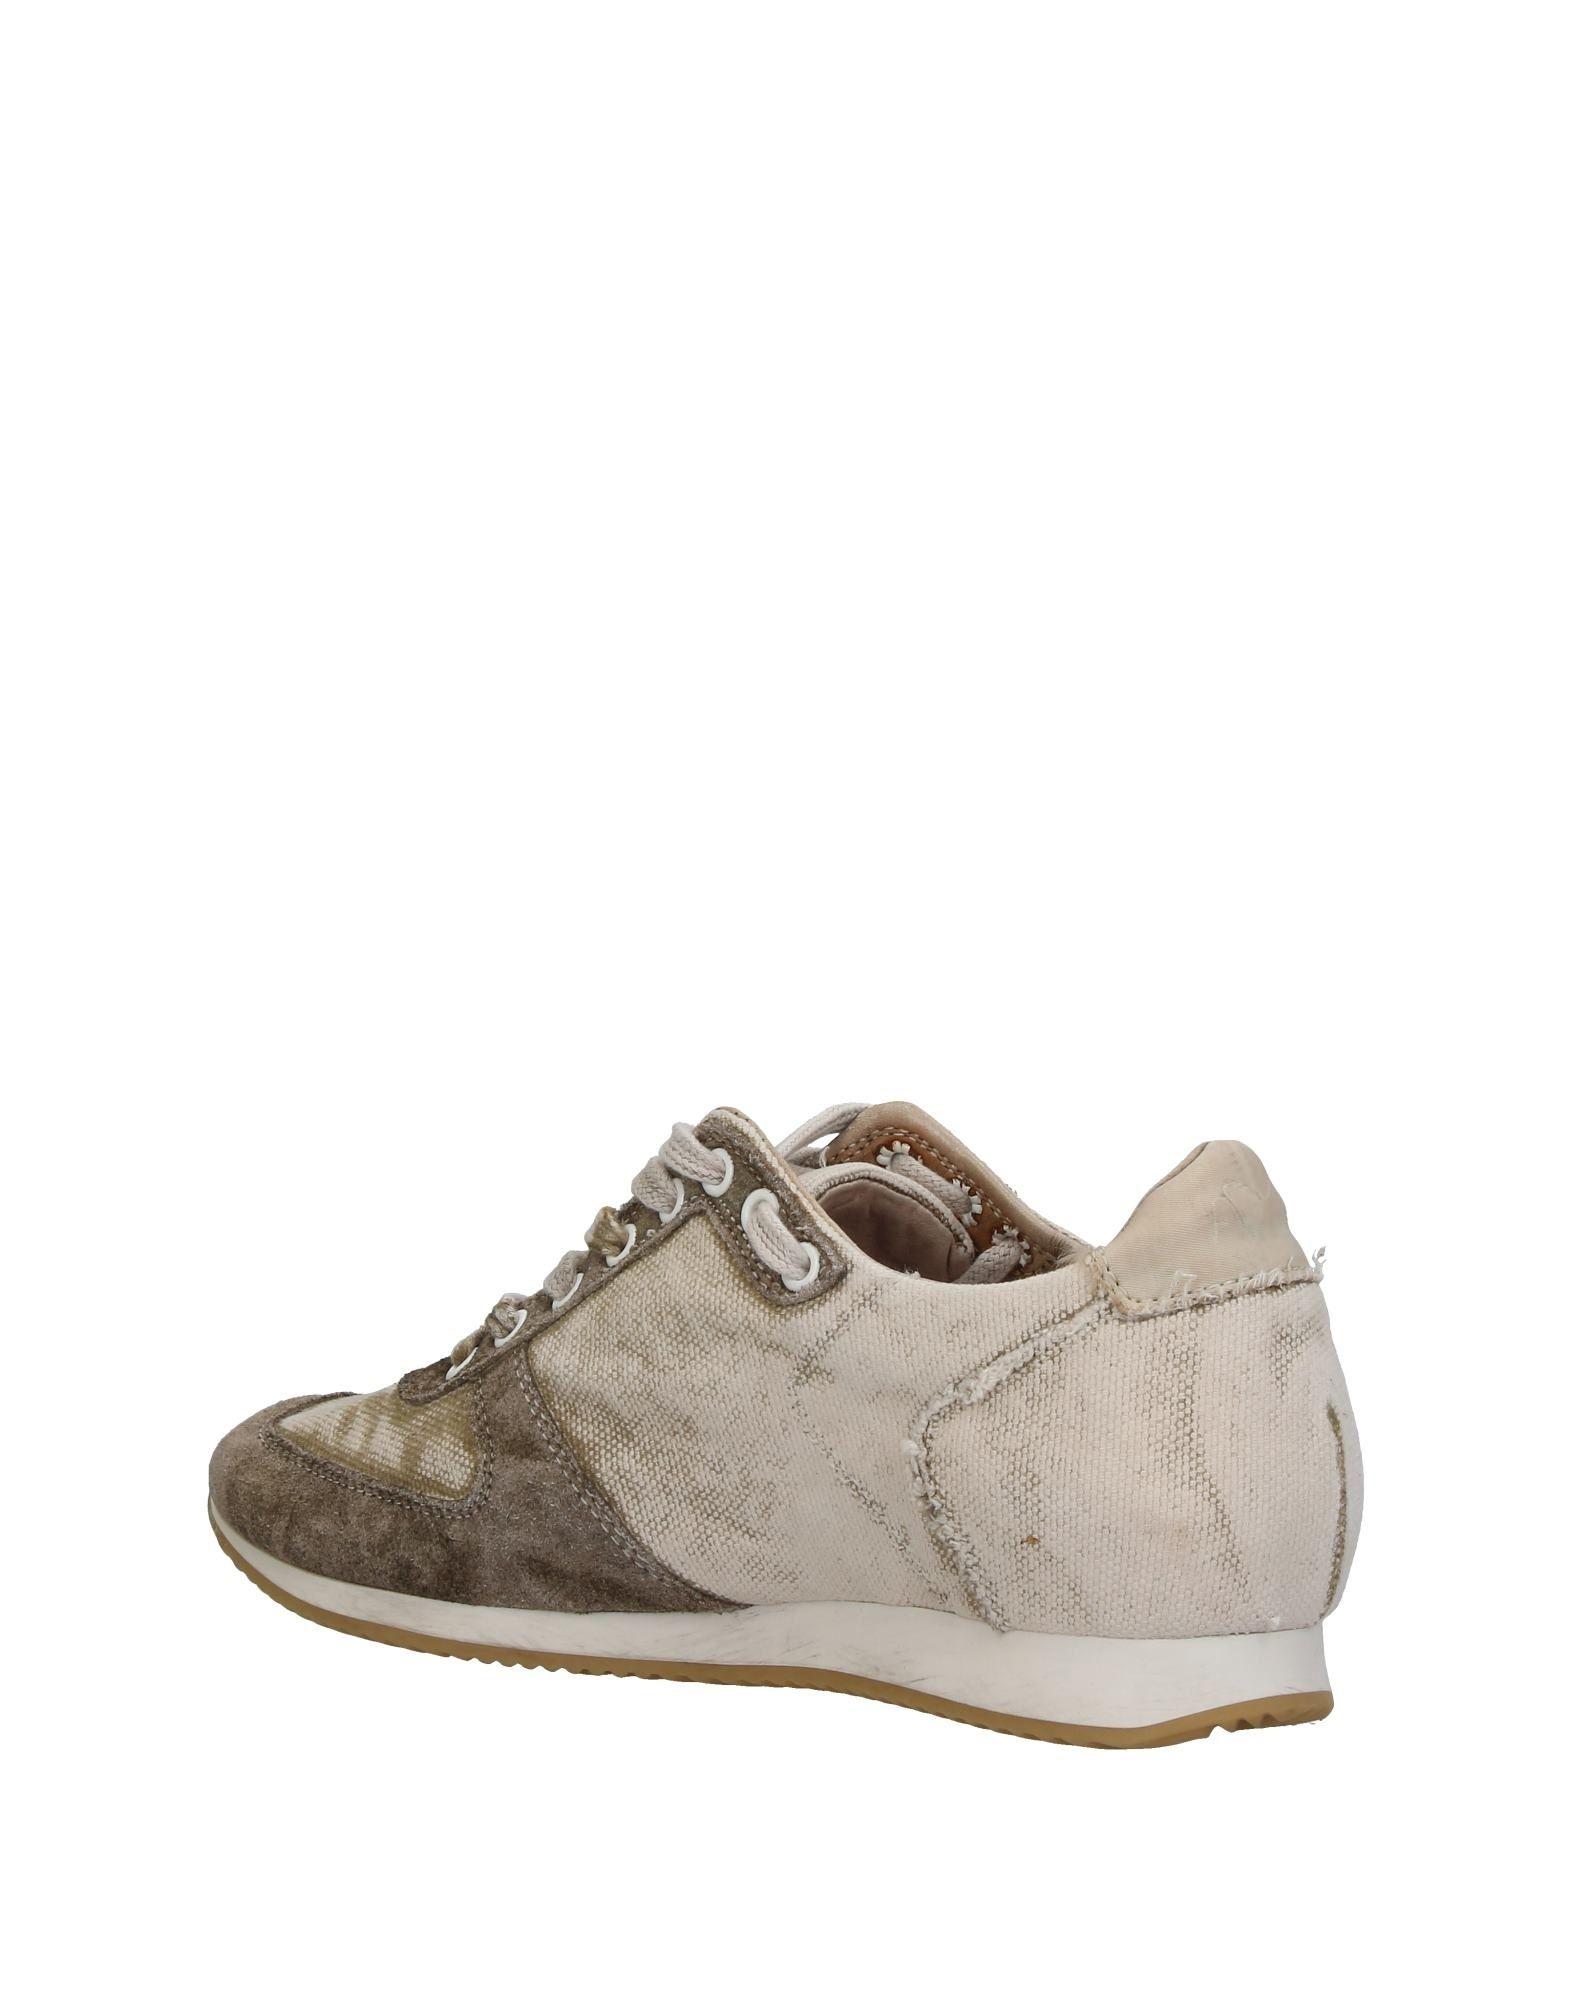 Sneakers Ama Brand Femme - Sneakers Ama Brand sur